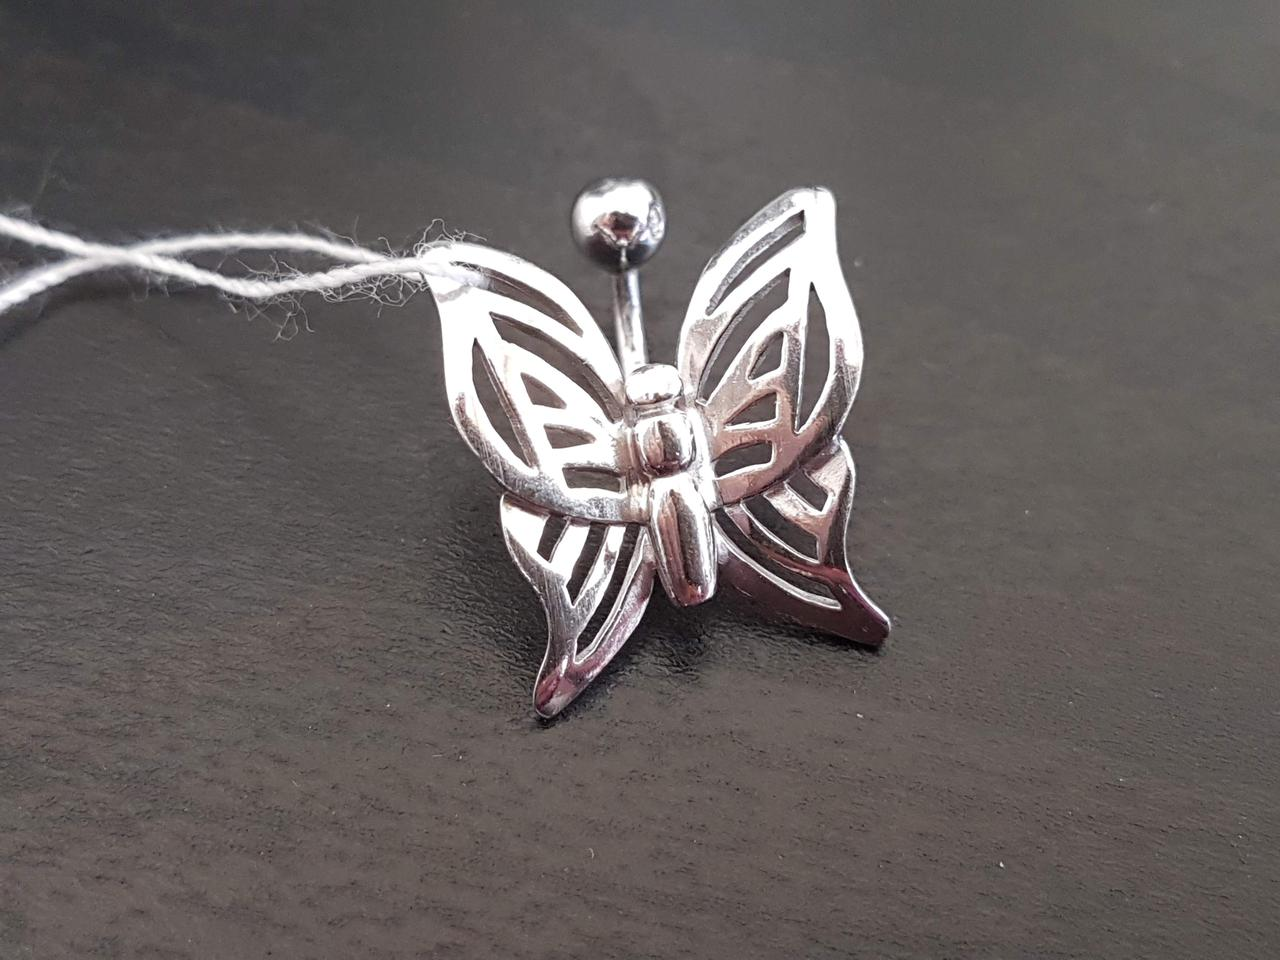 Серебряная серьга для пирсинга пупка. Артикул 7769-Р